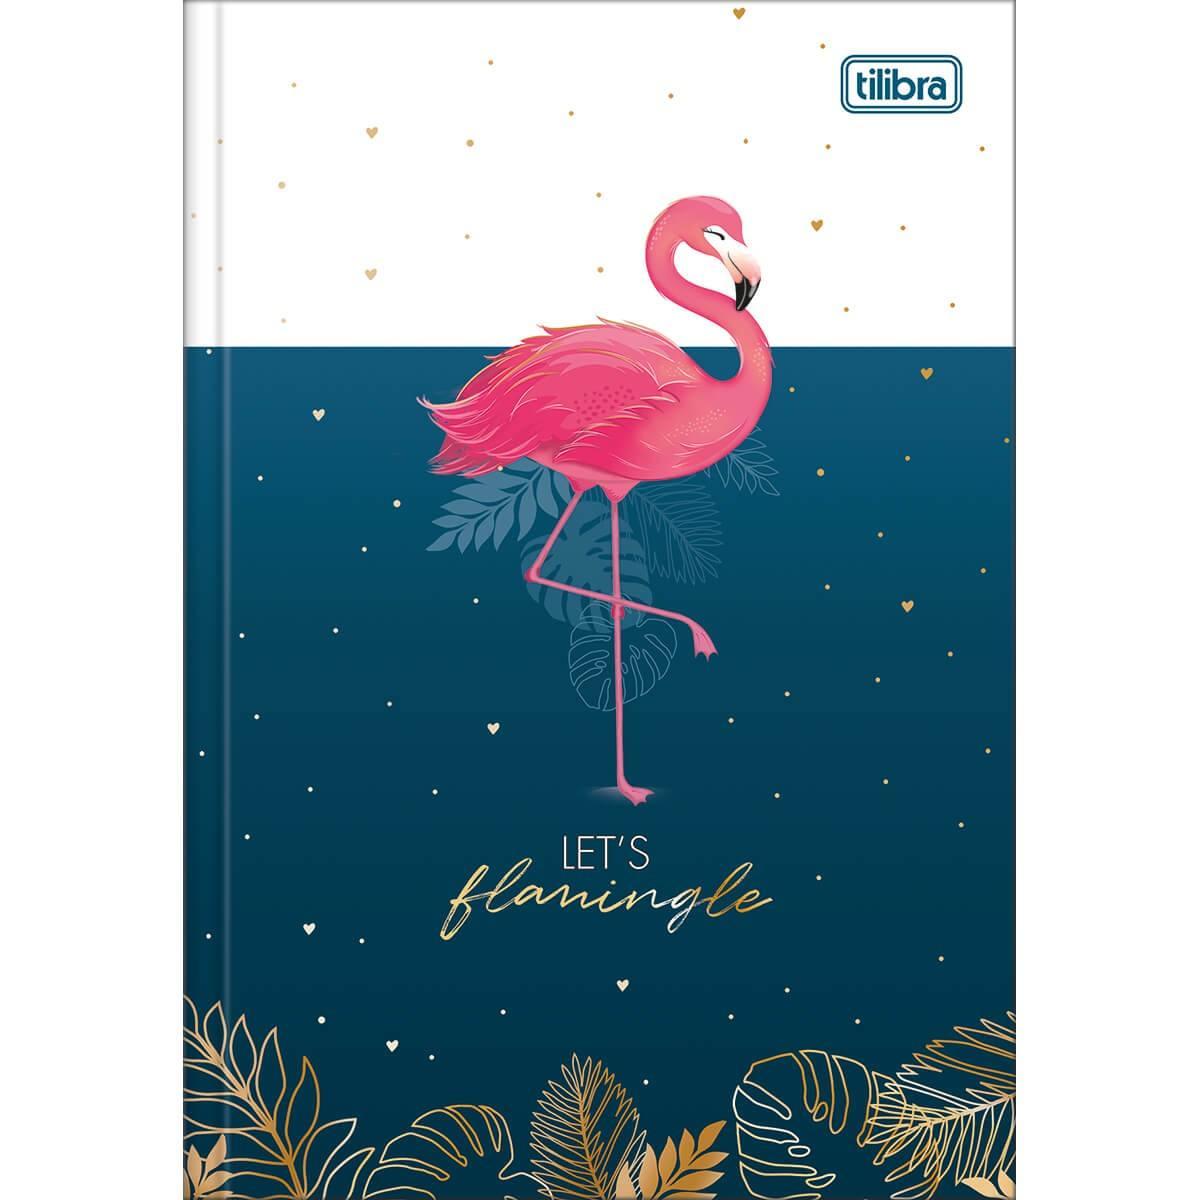 Caderno Brochura Capa Dura 1/4 Aloha 80 Fls - Tilibra